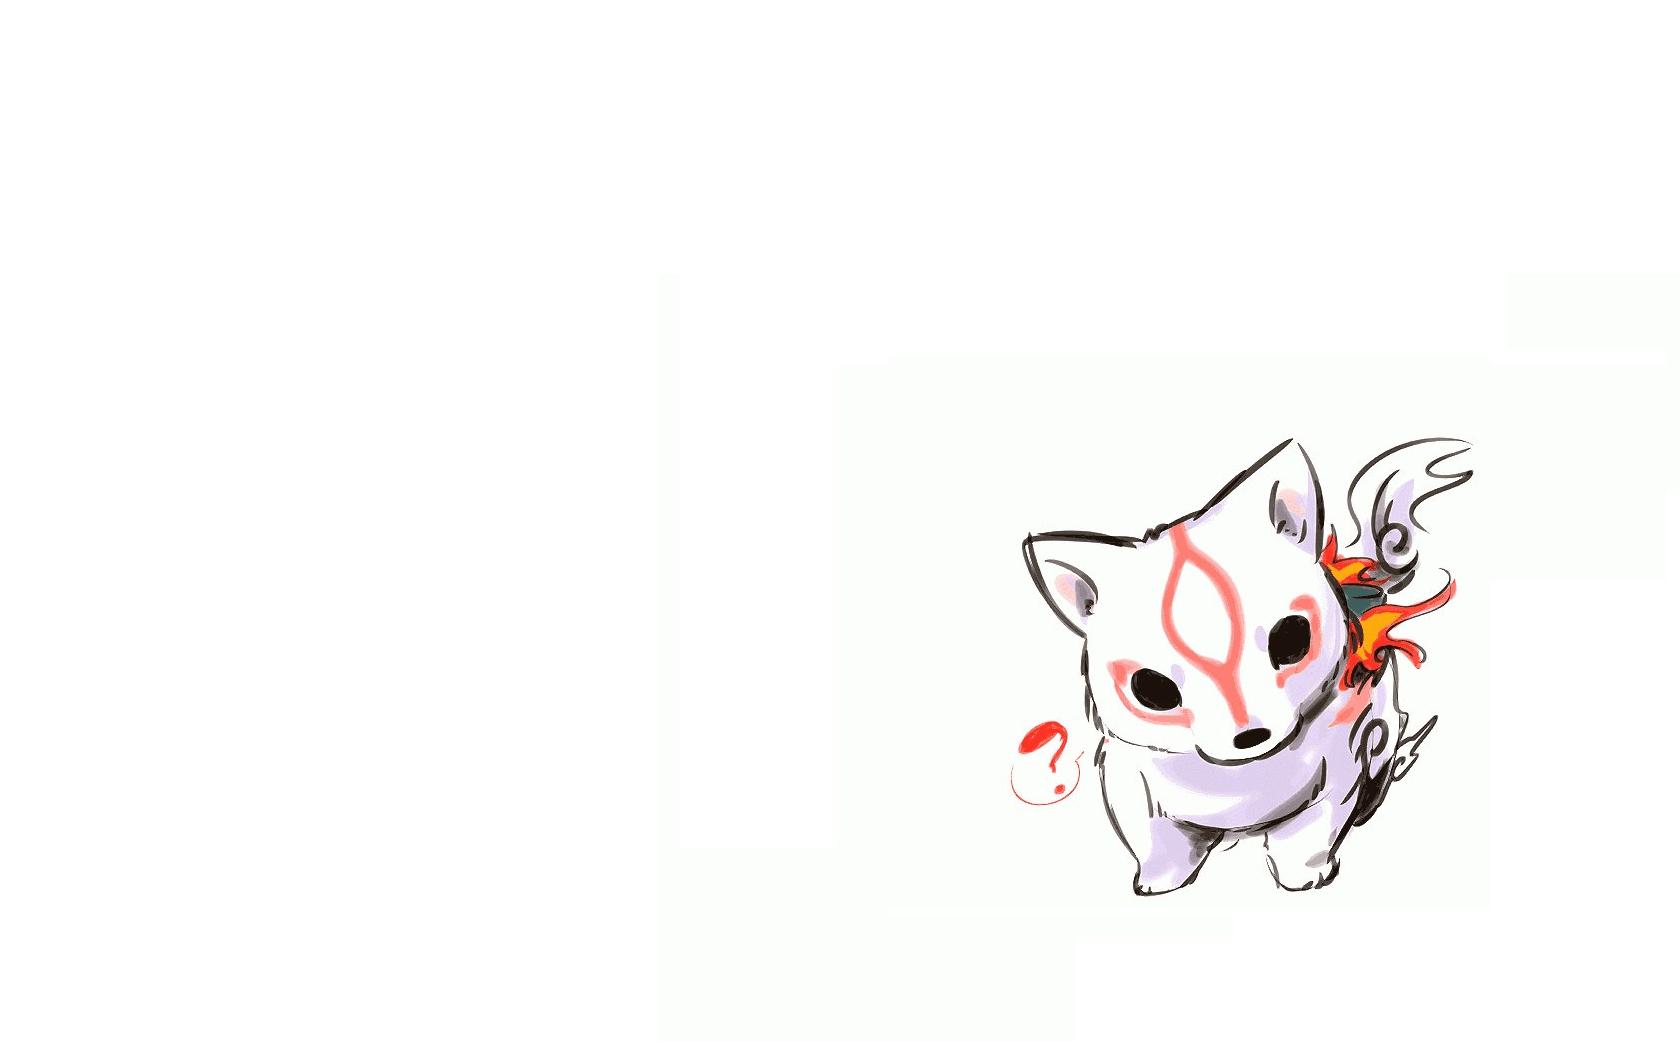 Cute Chibi Anime Desktop Wallpaper Ōkami Wallpaper And Background Image 1680x1050 Id